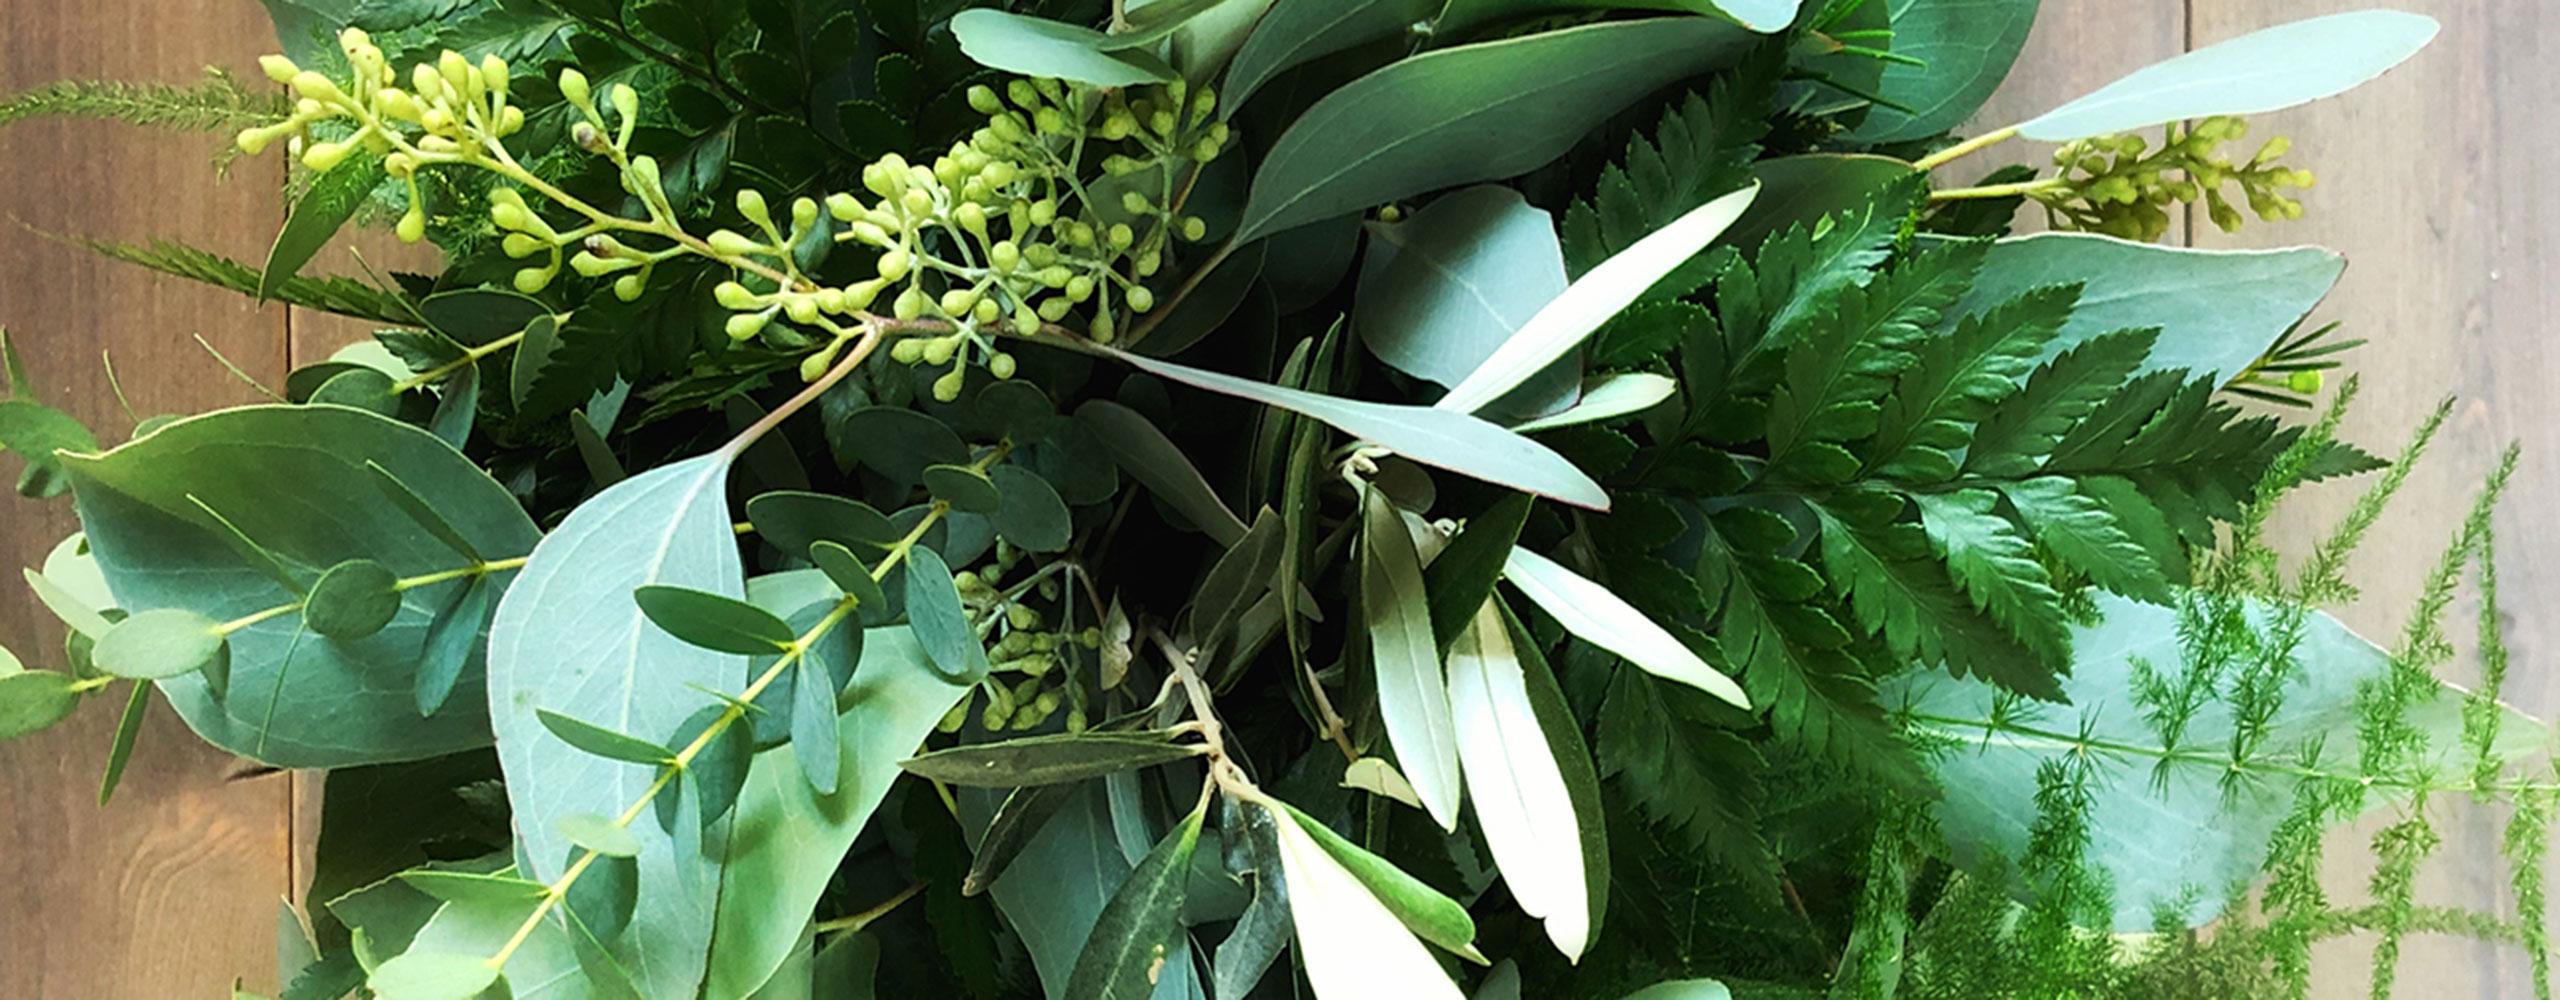 Brautstrauss gruen 'greenery-style' - Kerstin Adrian Floristin